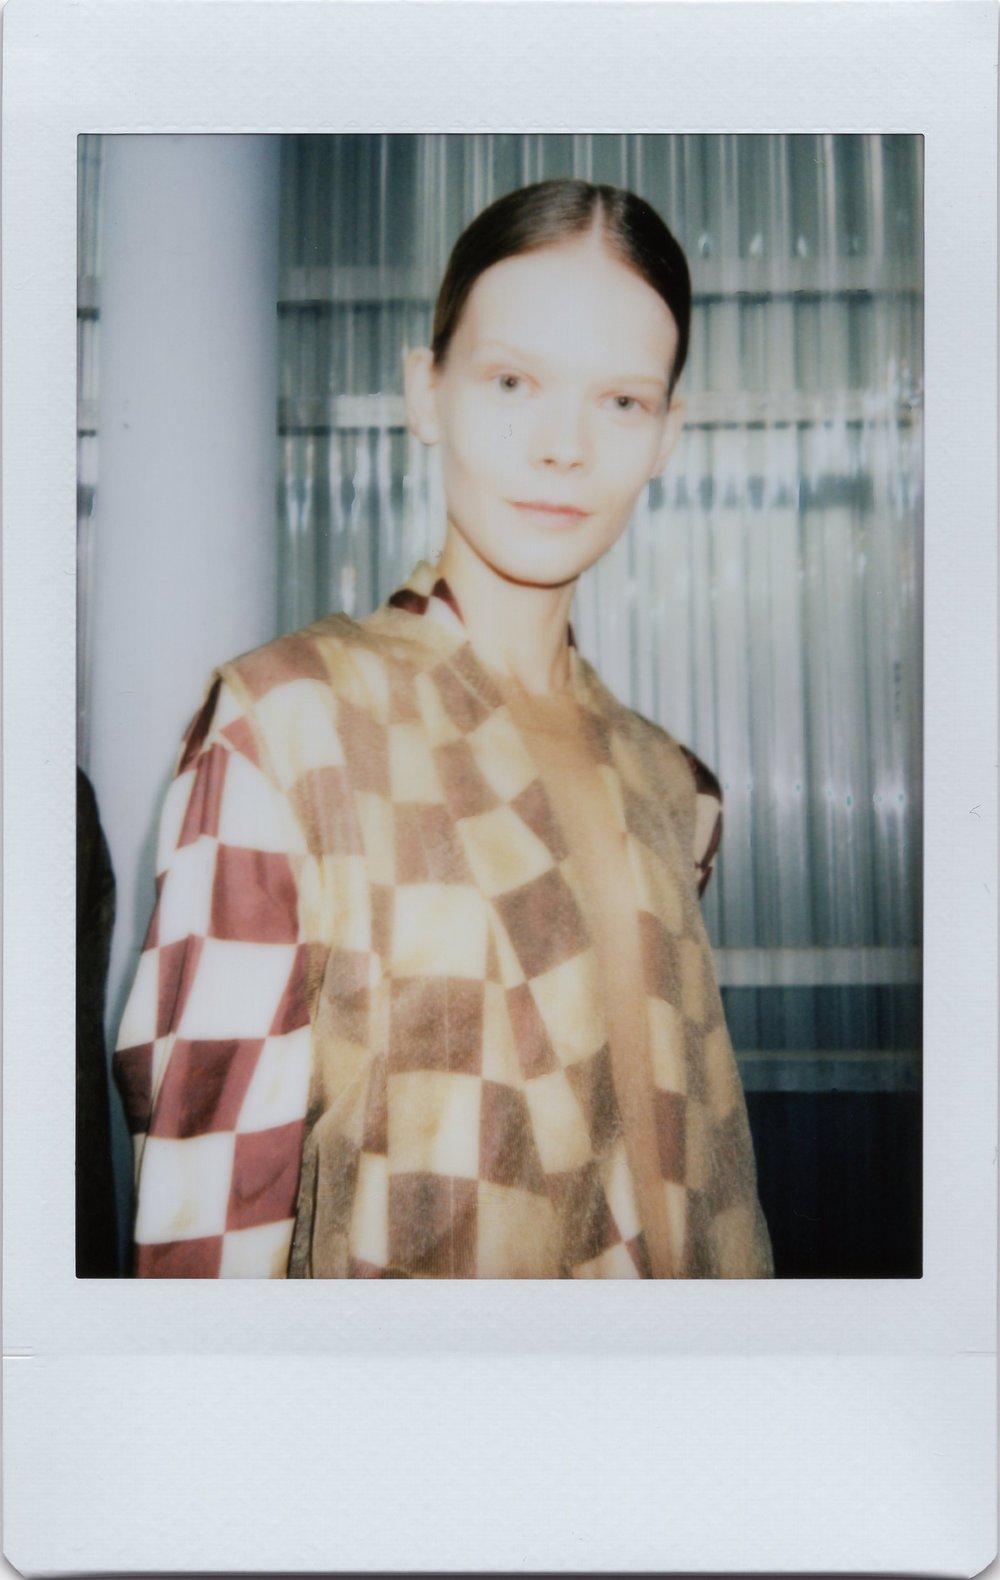 UmaWang_Honigschreck_Polaroid_7.jpg